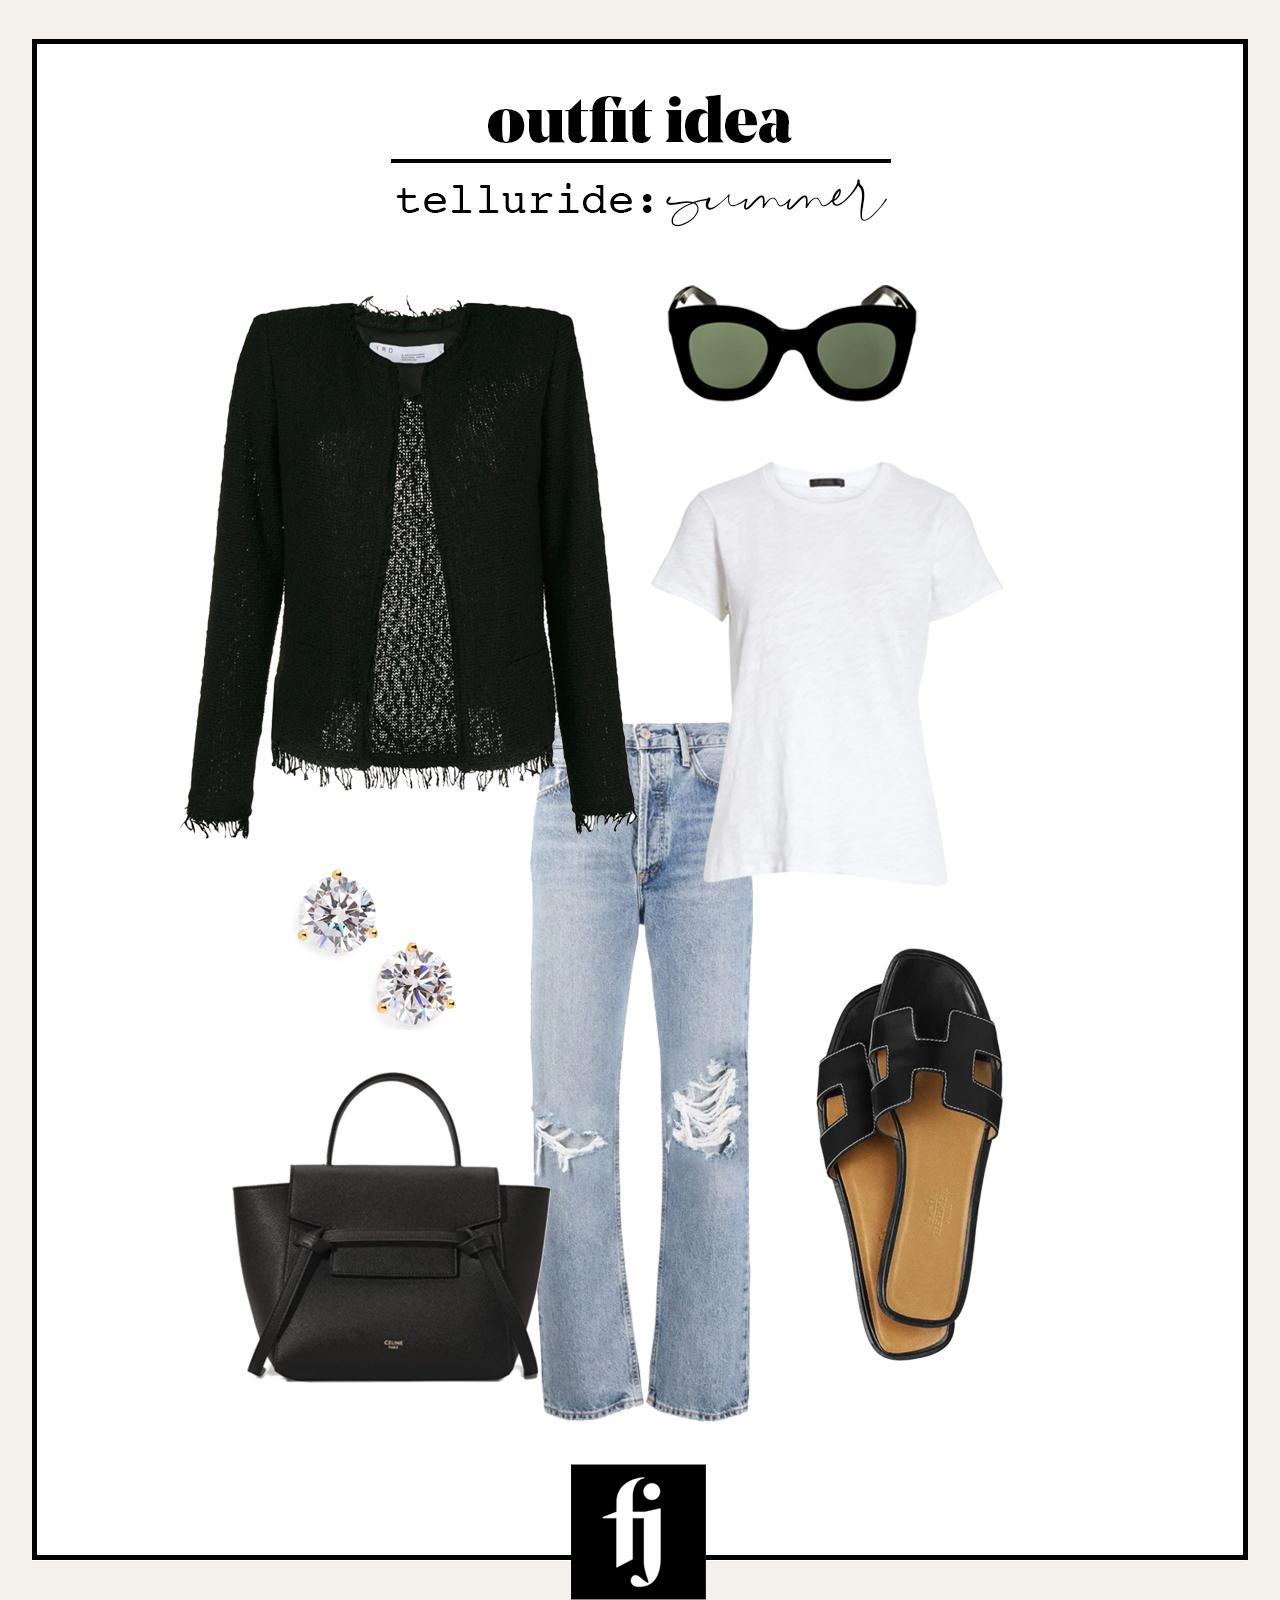 telluride summer outfit idea 4